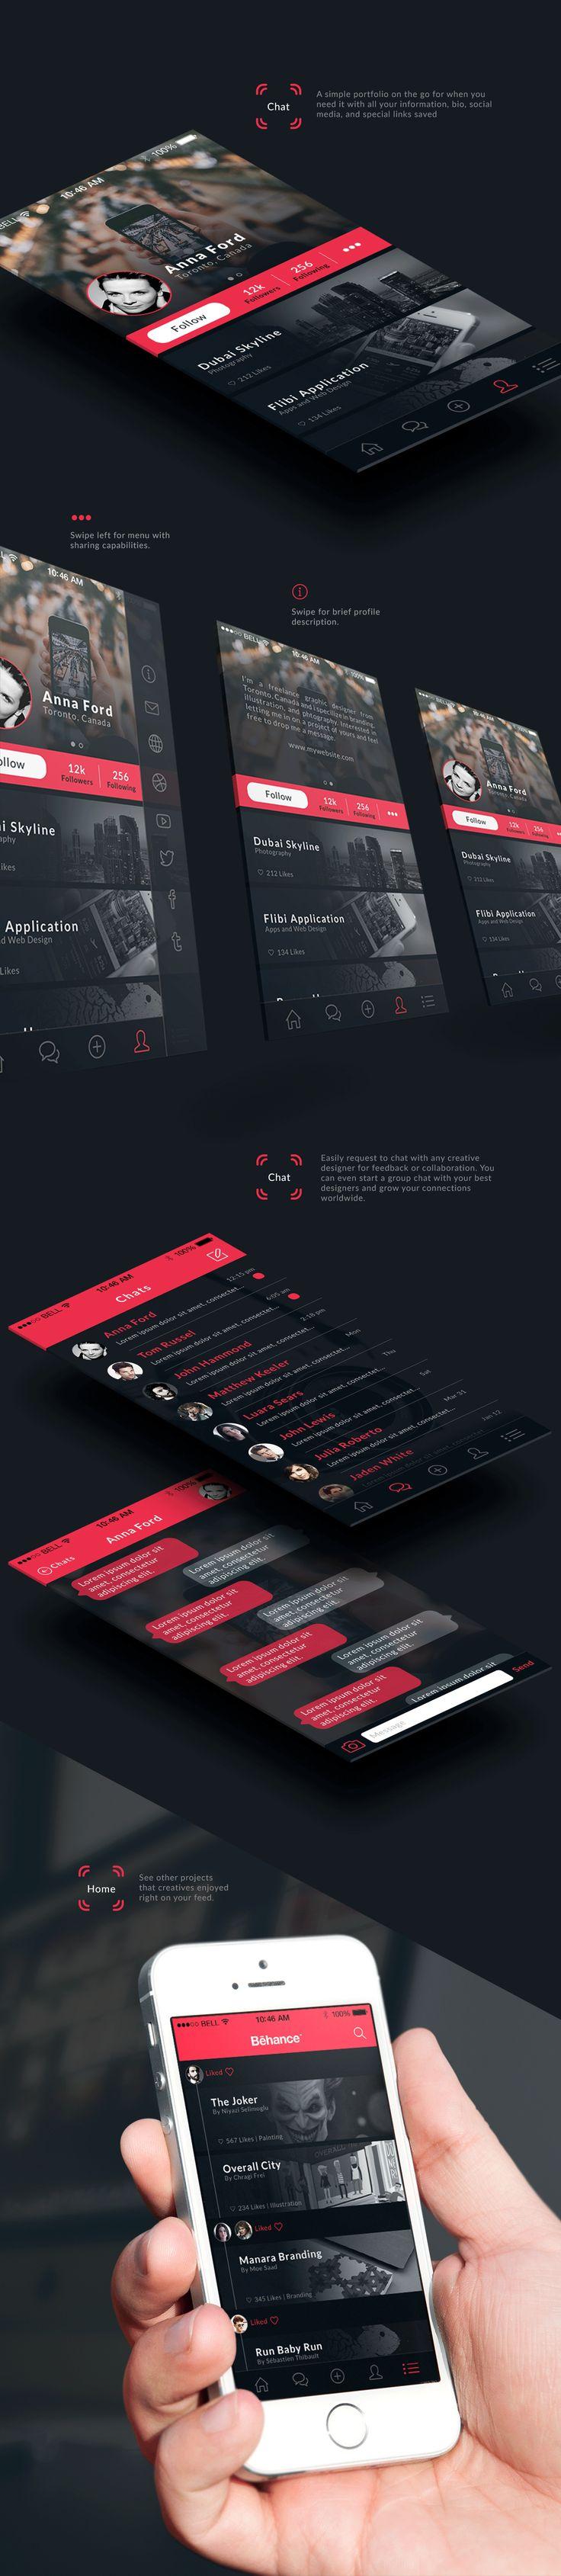 Behance Plus iPhone App on Behance